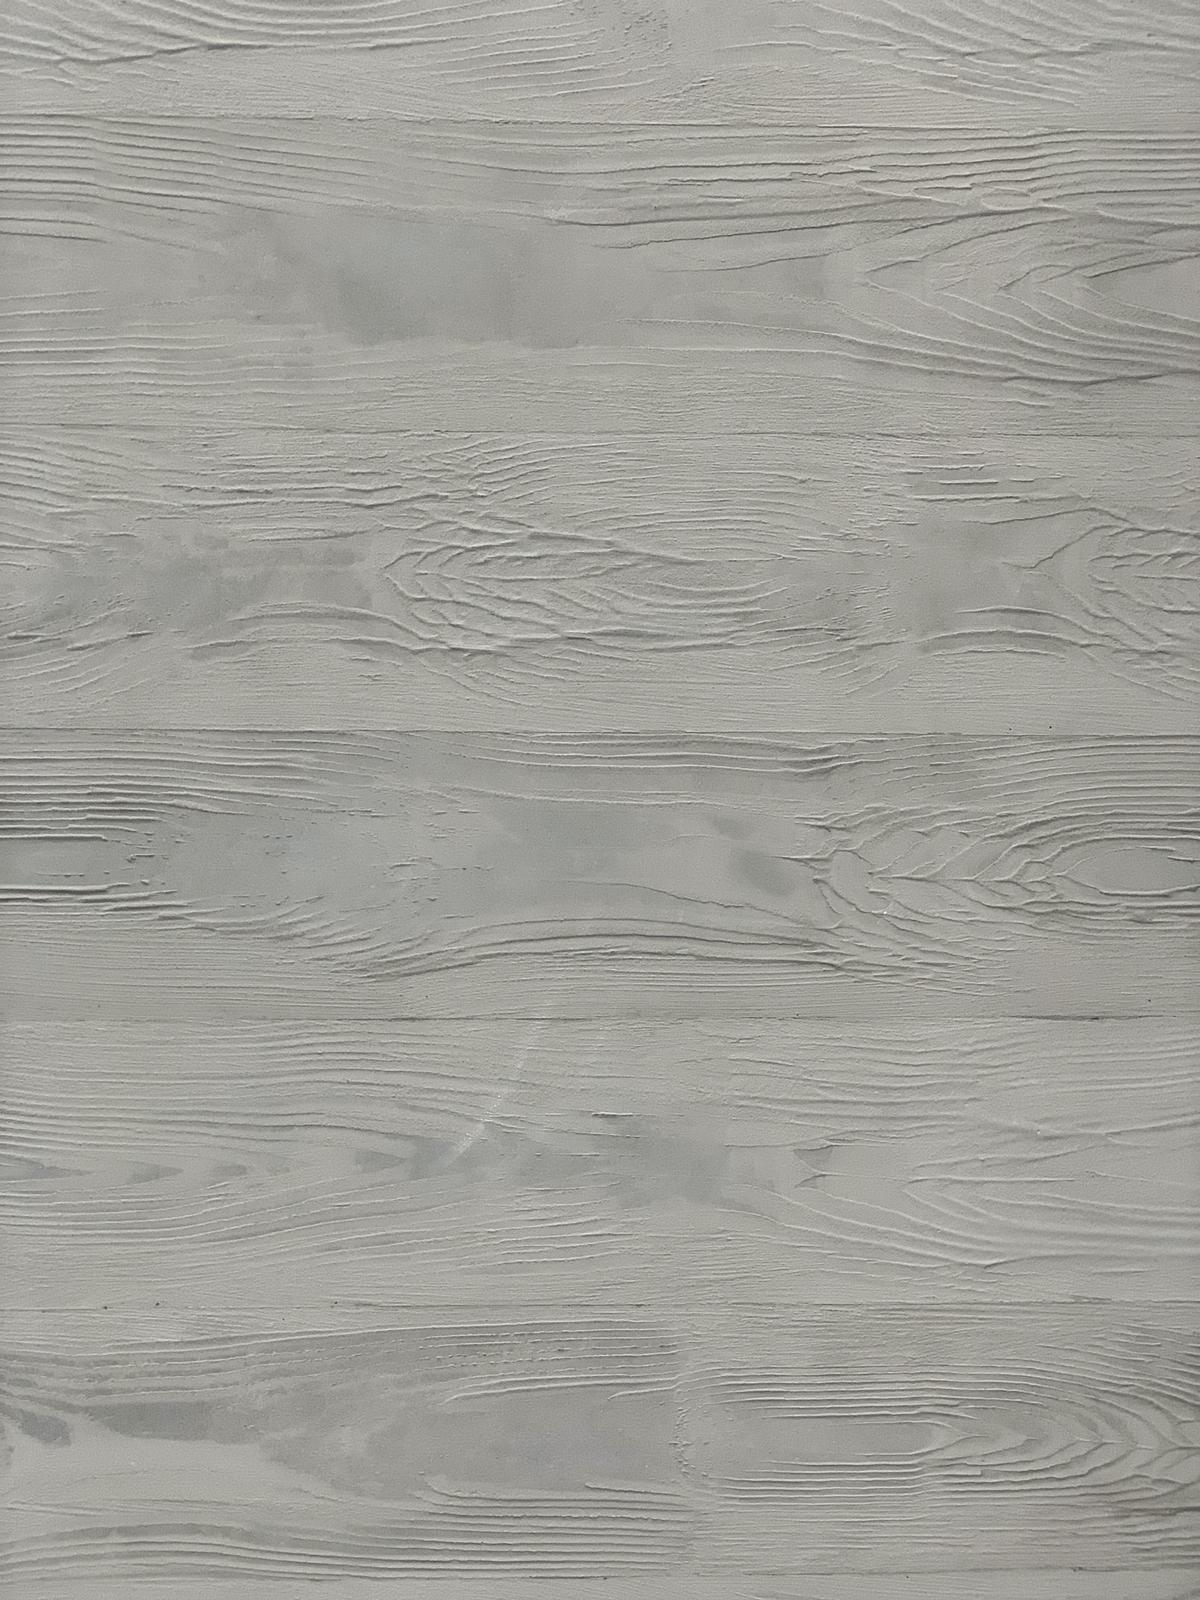 Golmex Meoded Paint And Plaster Concrete Concrete Wall Concrete Mixes